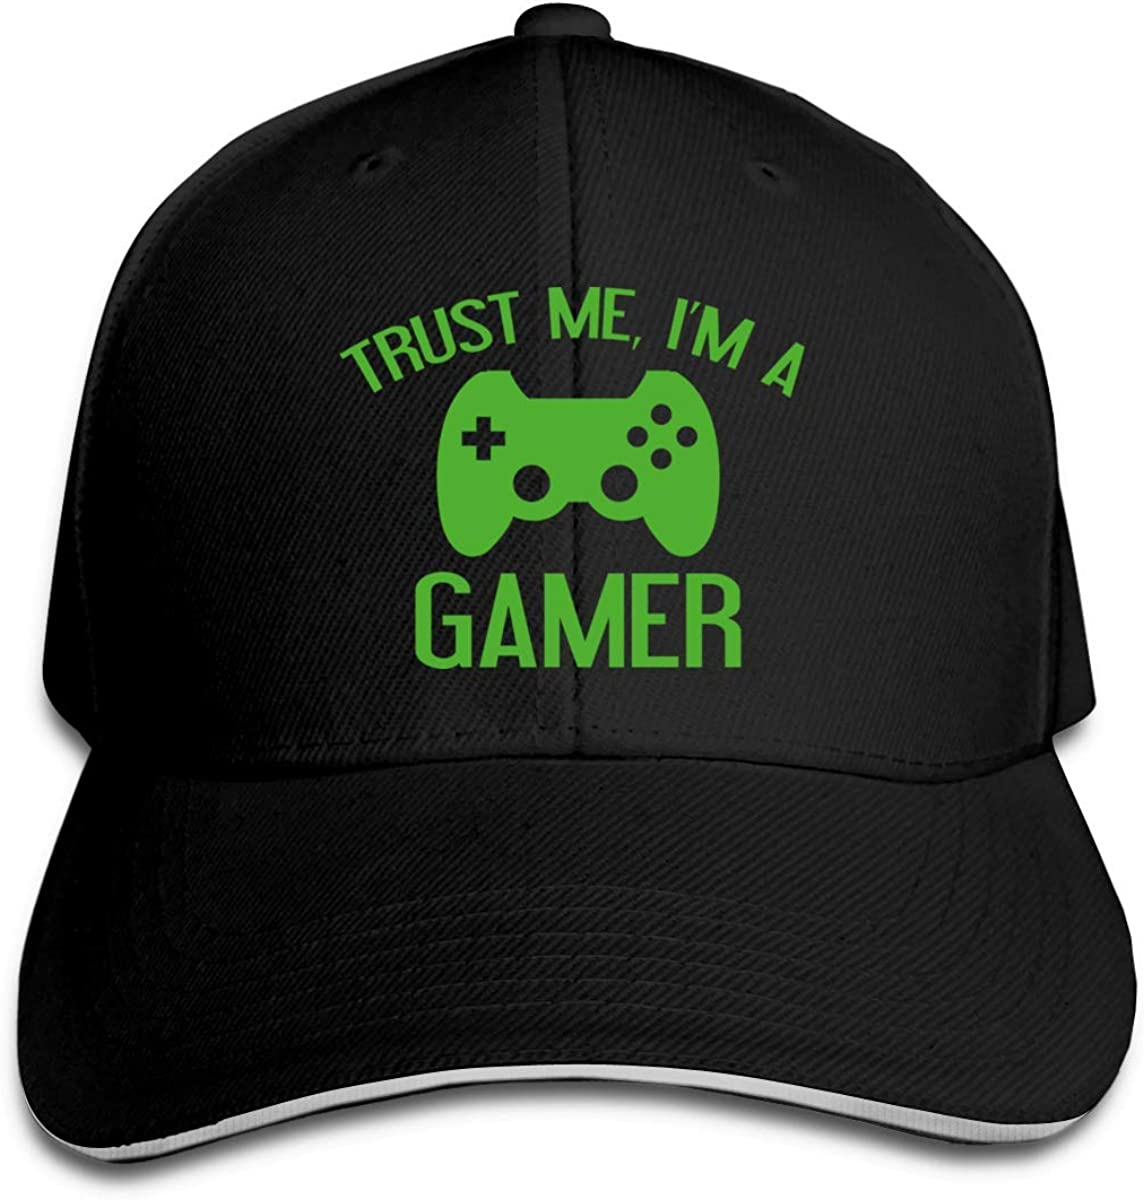 Novelty Gamer Socks Cap Hat,Funny Gifts for Men Women Kids Teen Boys Father